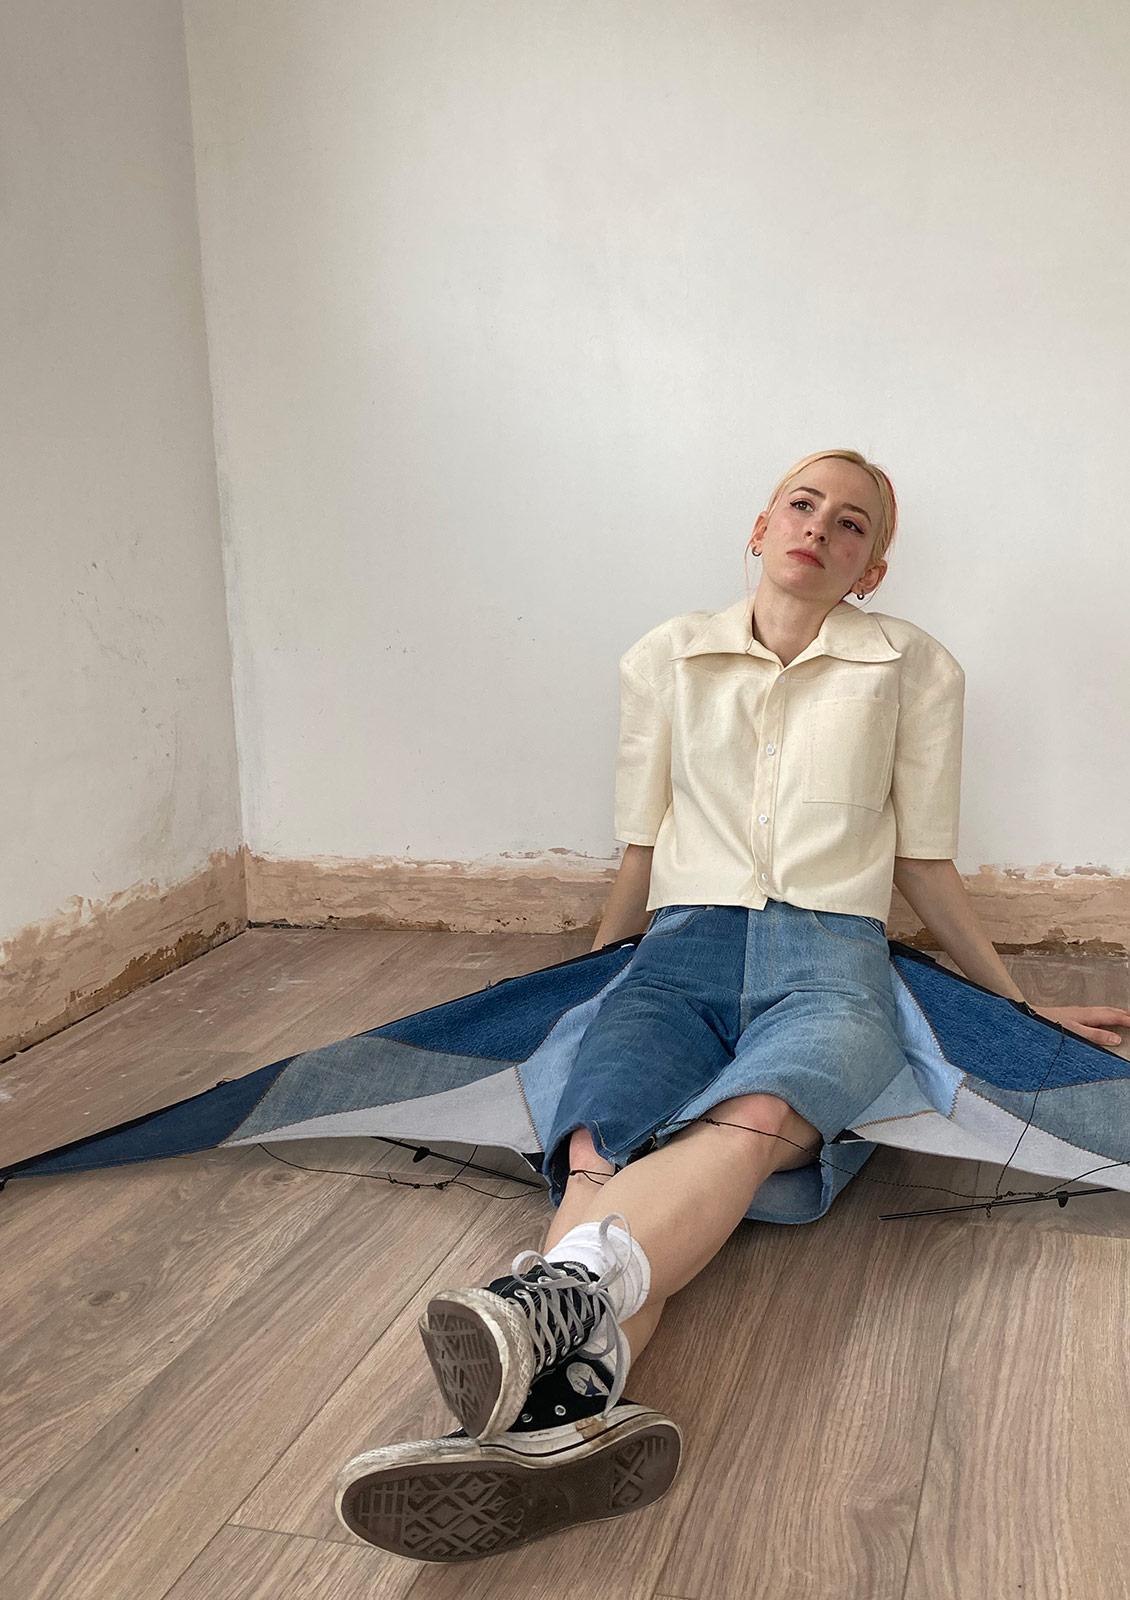 alexandra armata jeans fashion designer csm kite